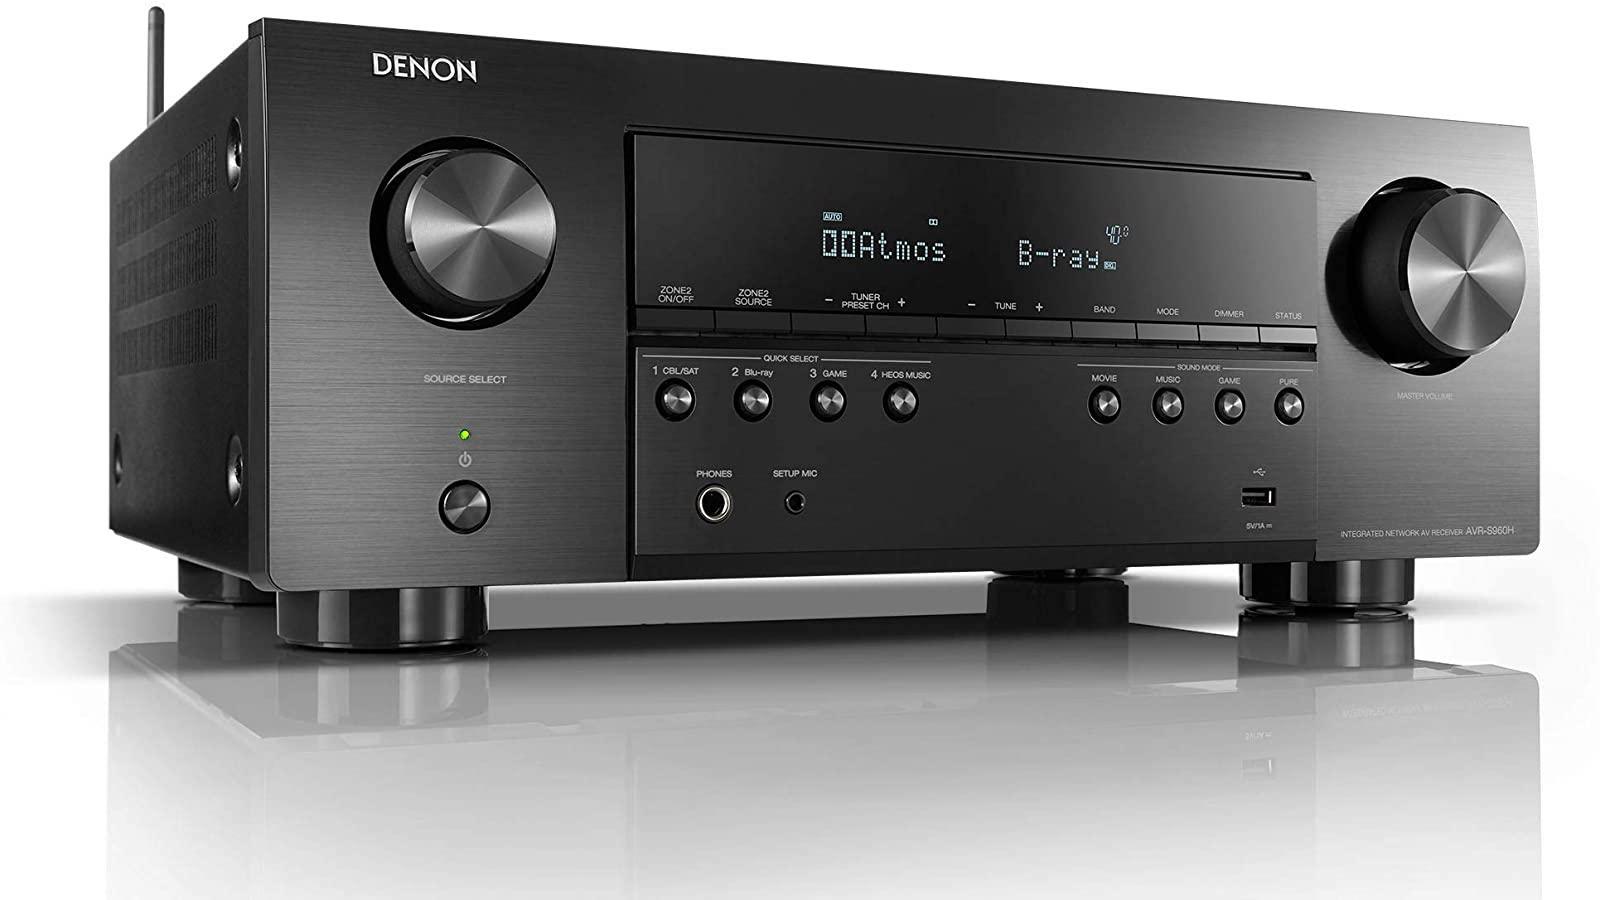 Denon AVR-S960H 8K A/V Receiver (2020)